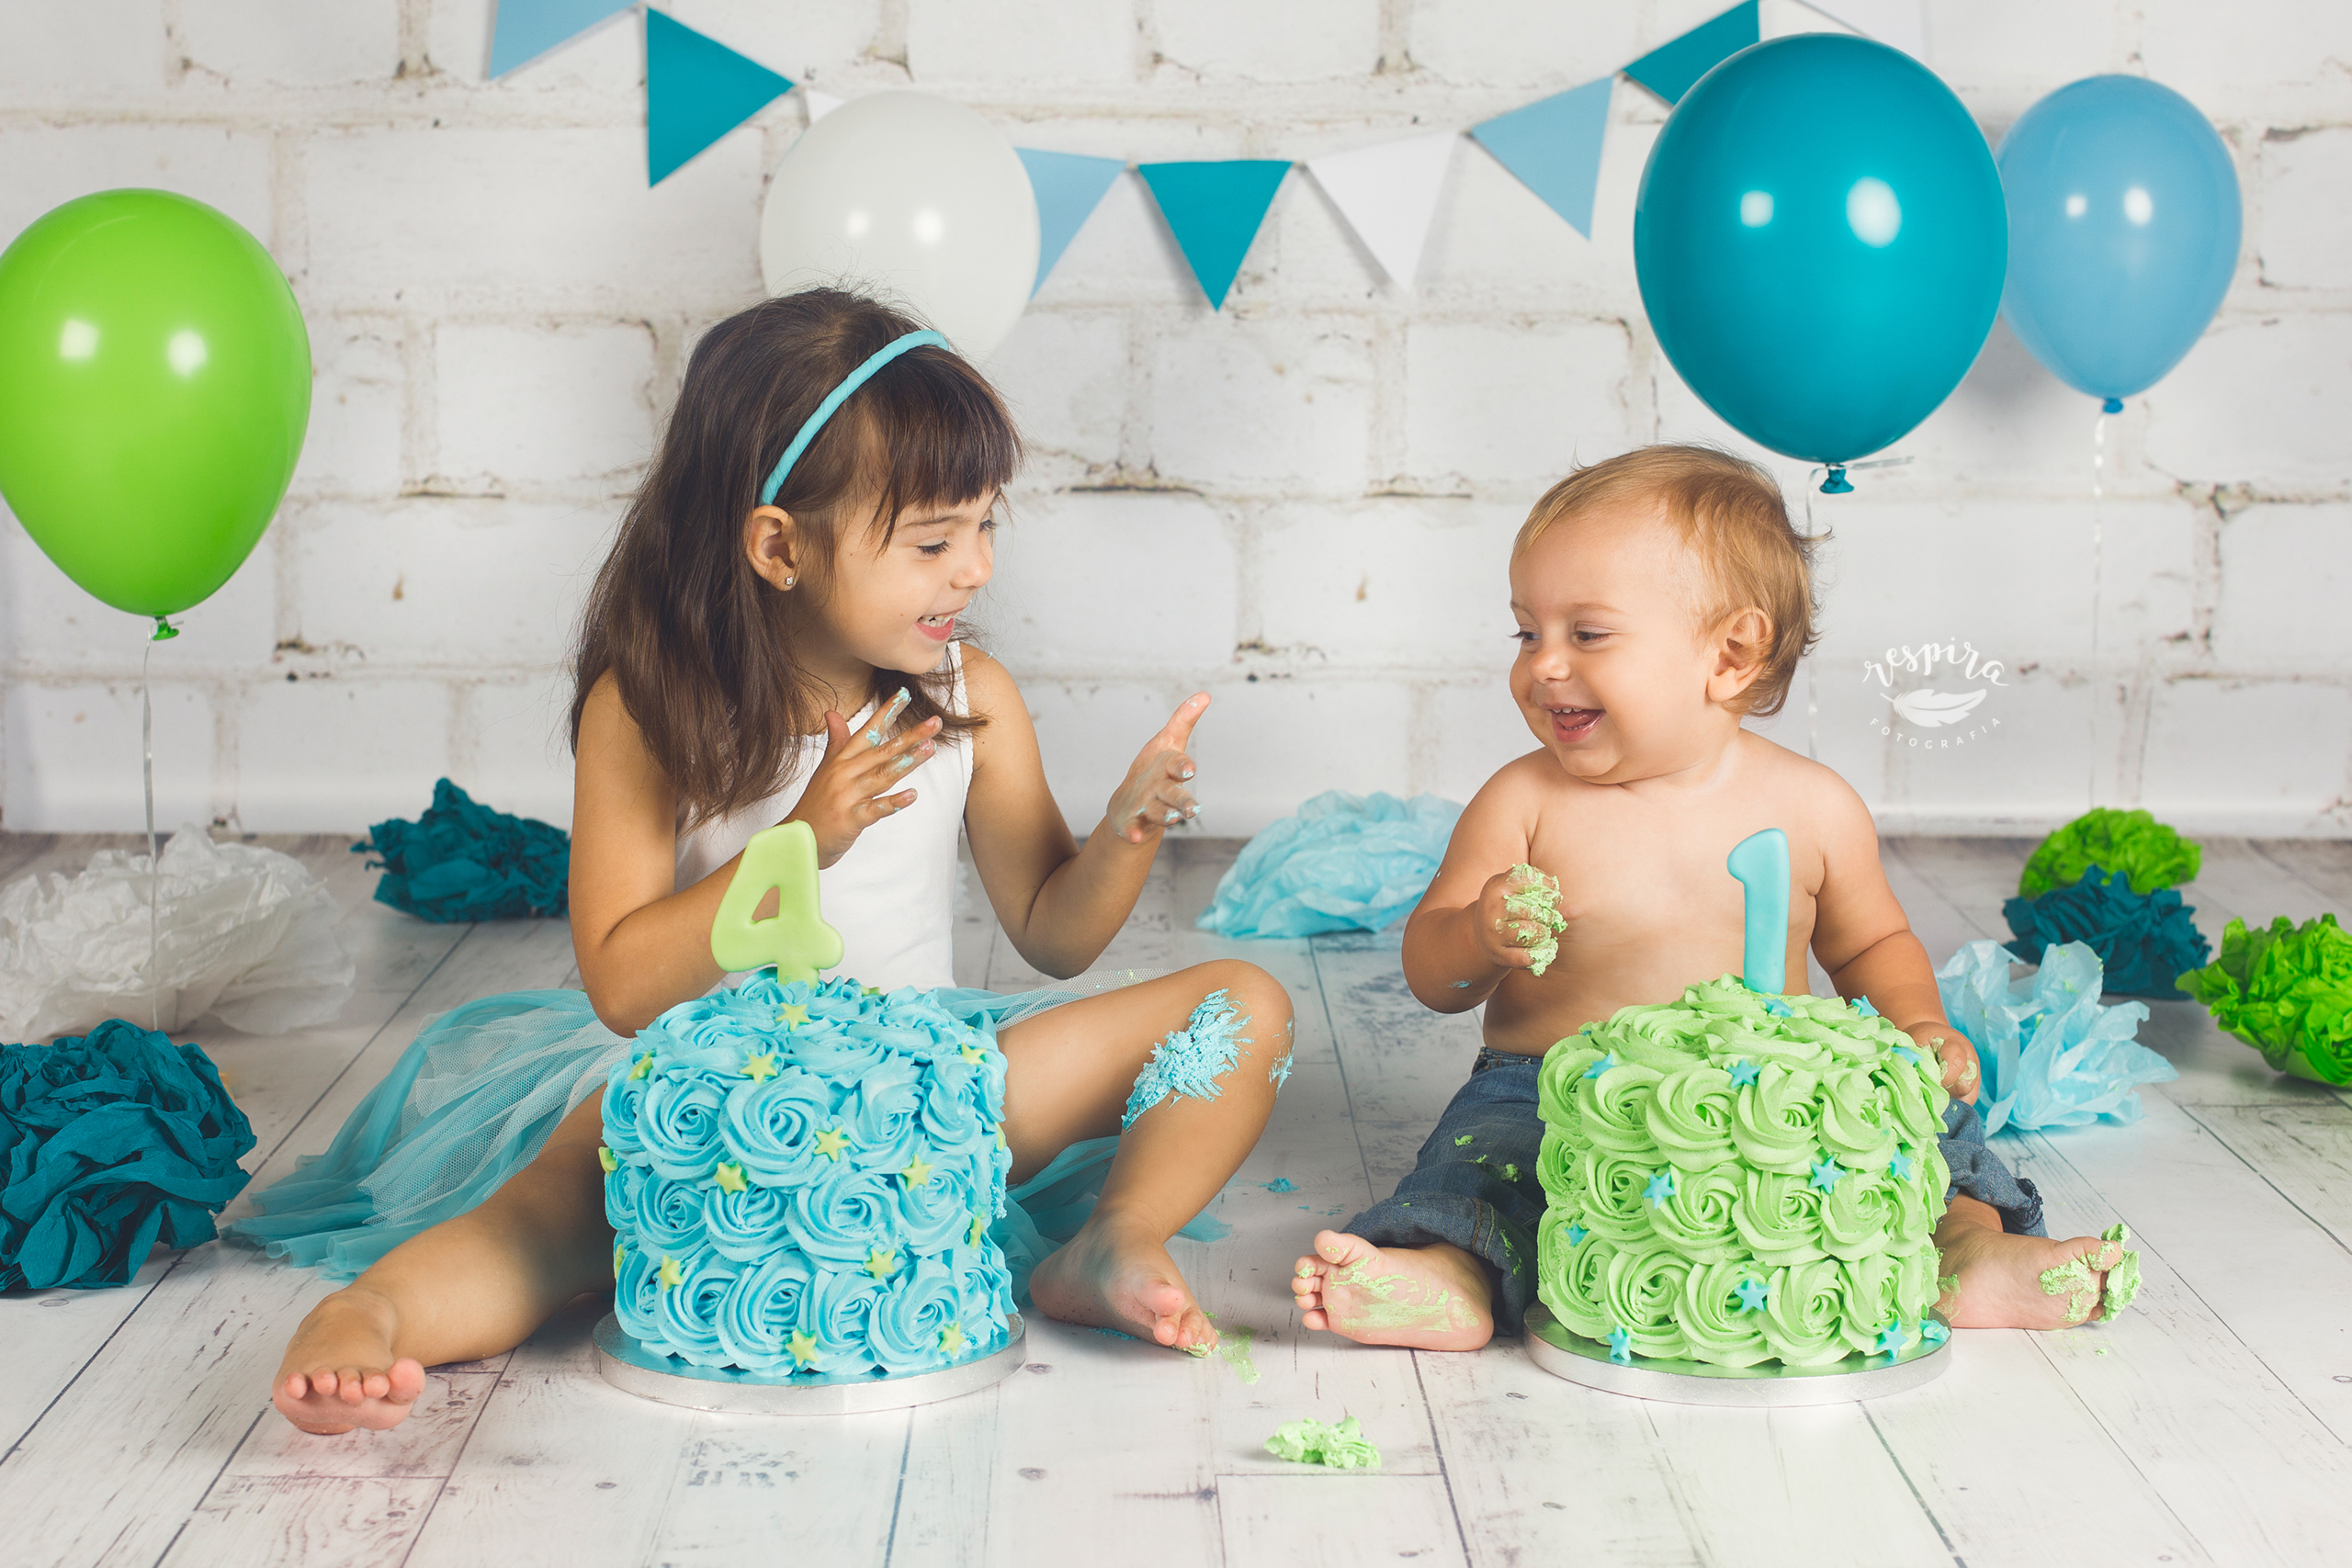 Sessions aniversari smash cake a olesa barcelona